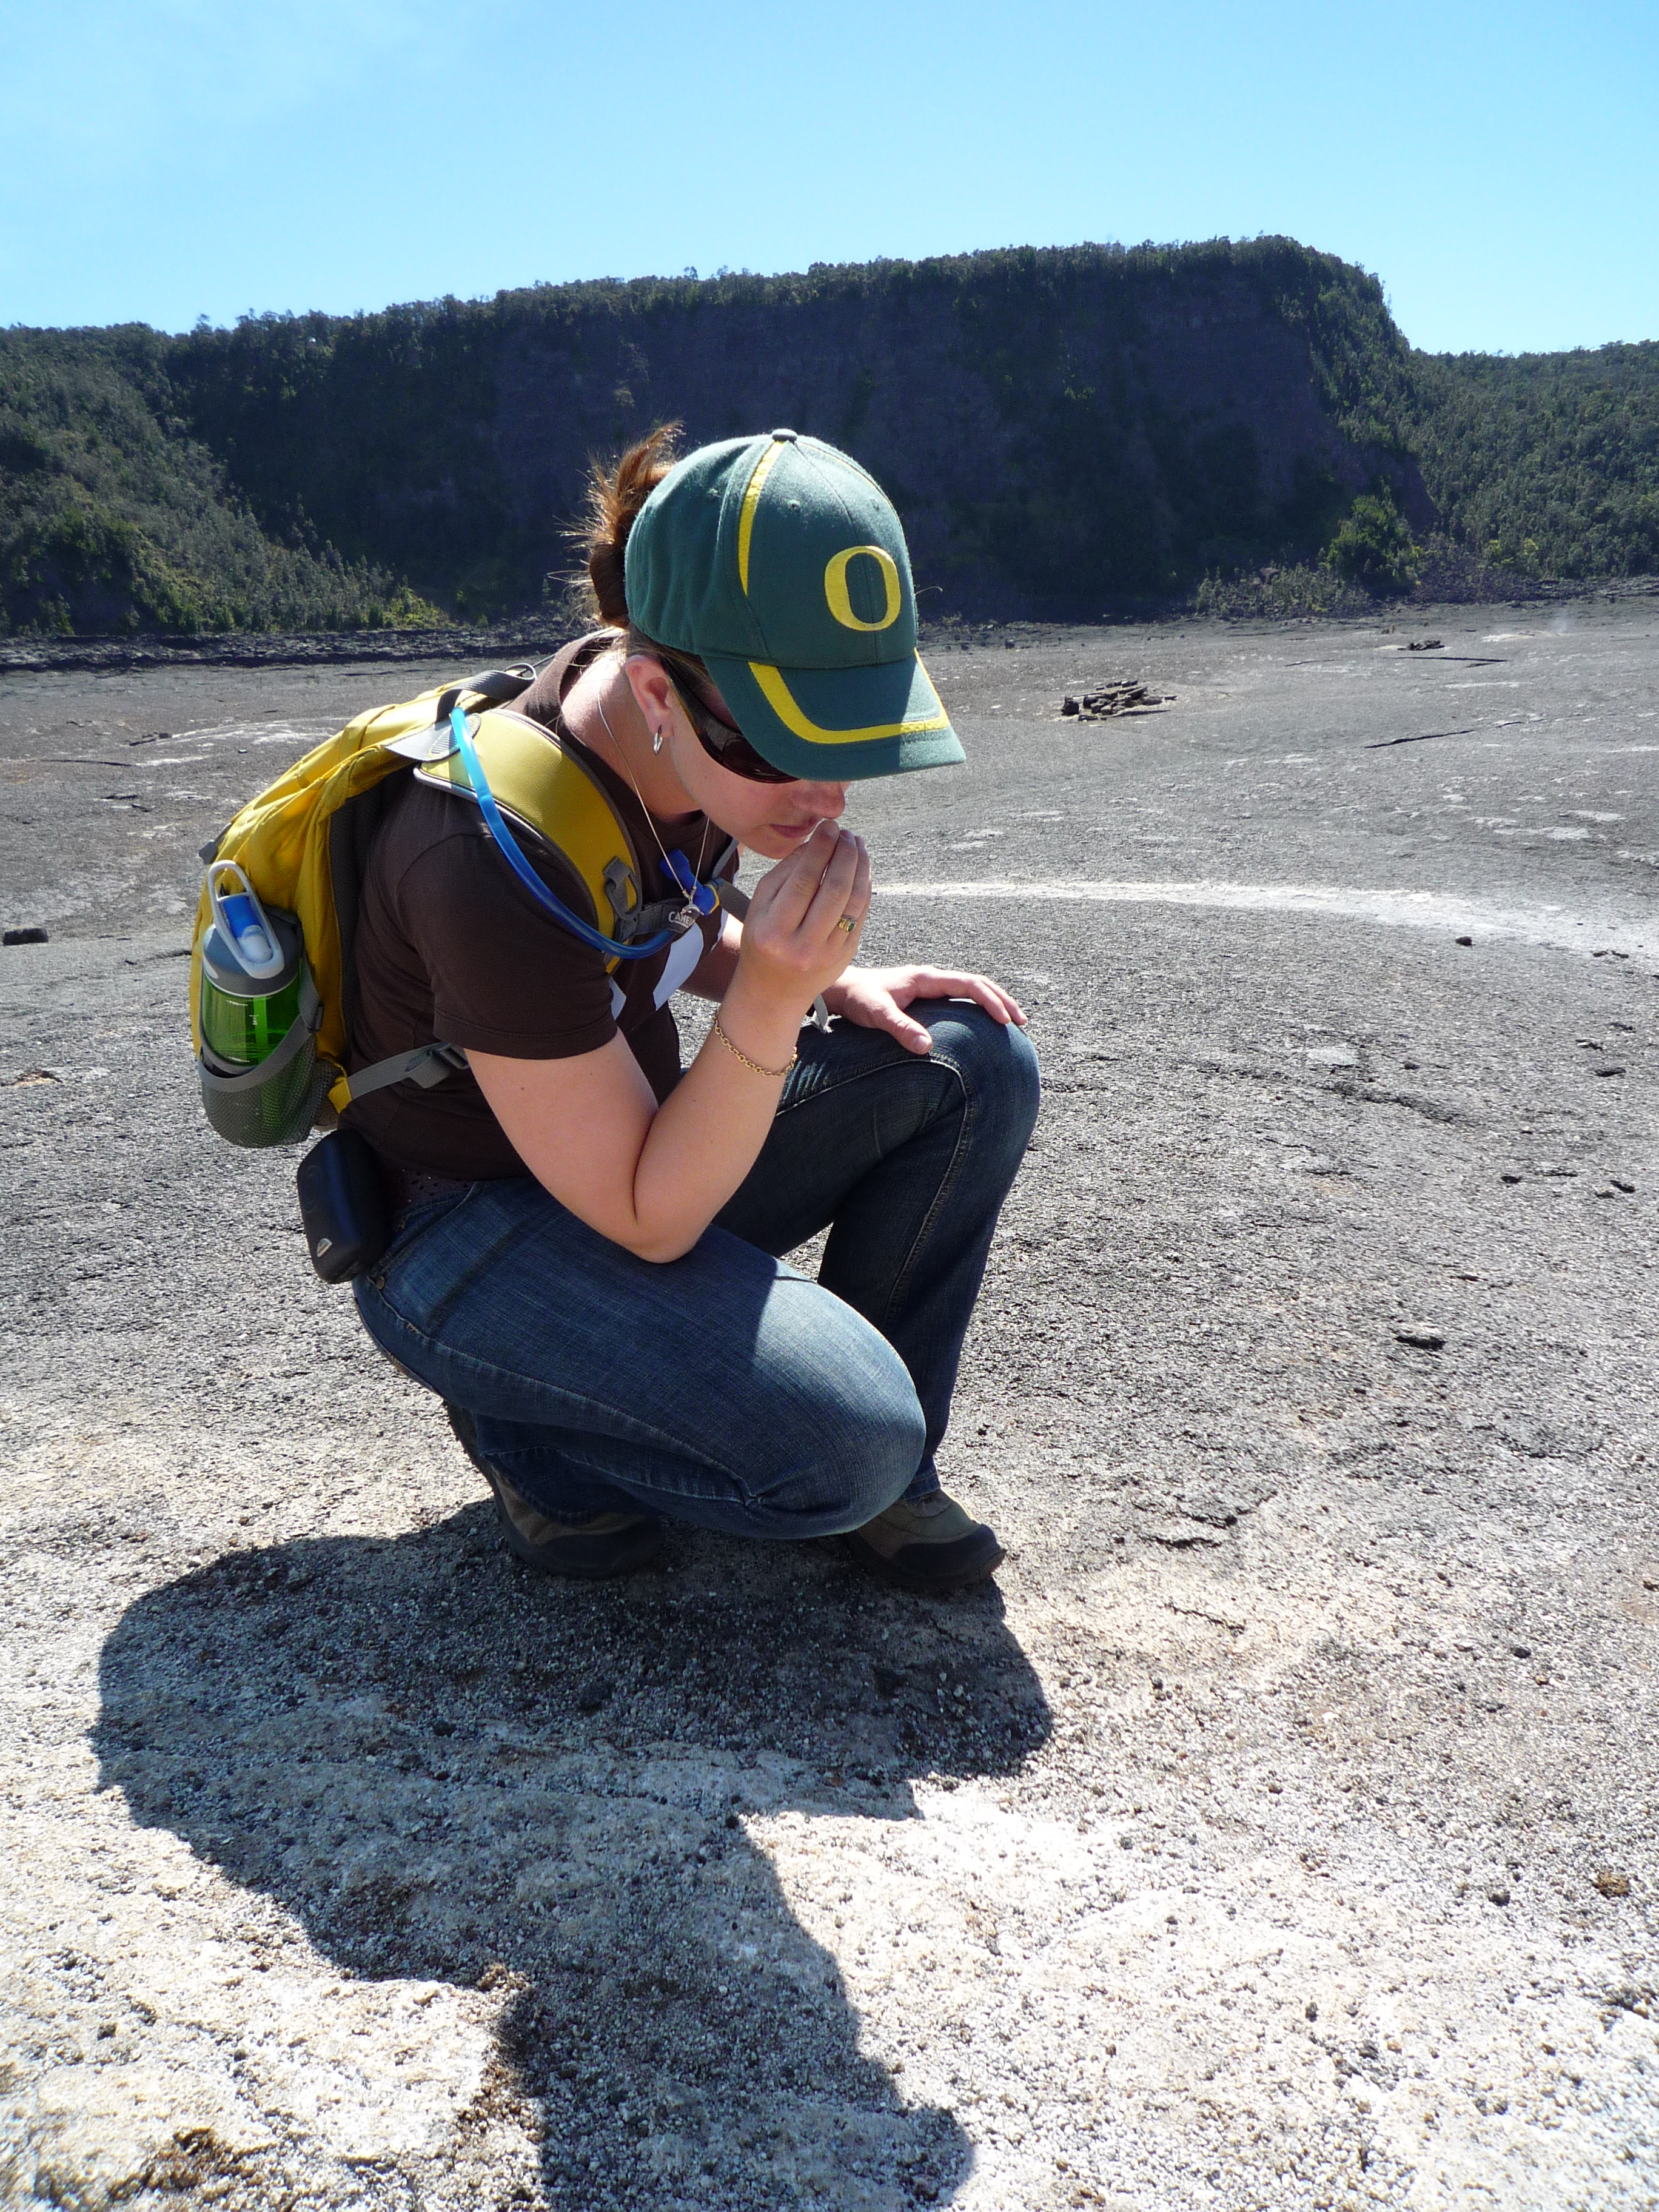 Patricia at Kilauea Iki